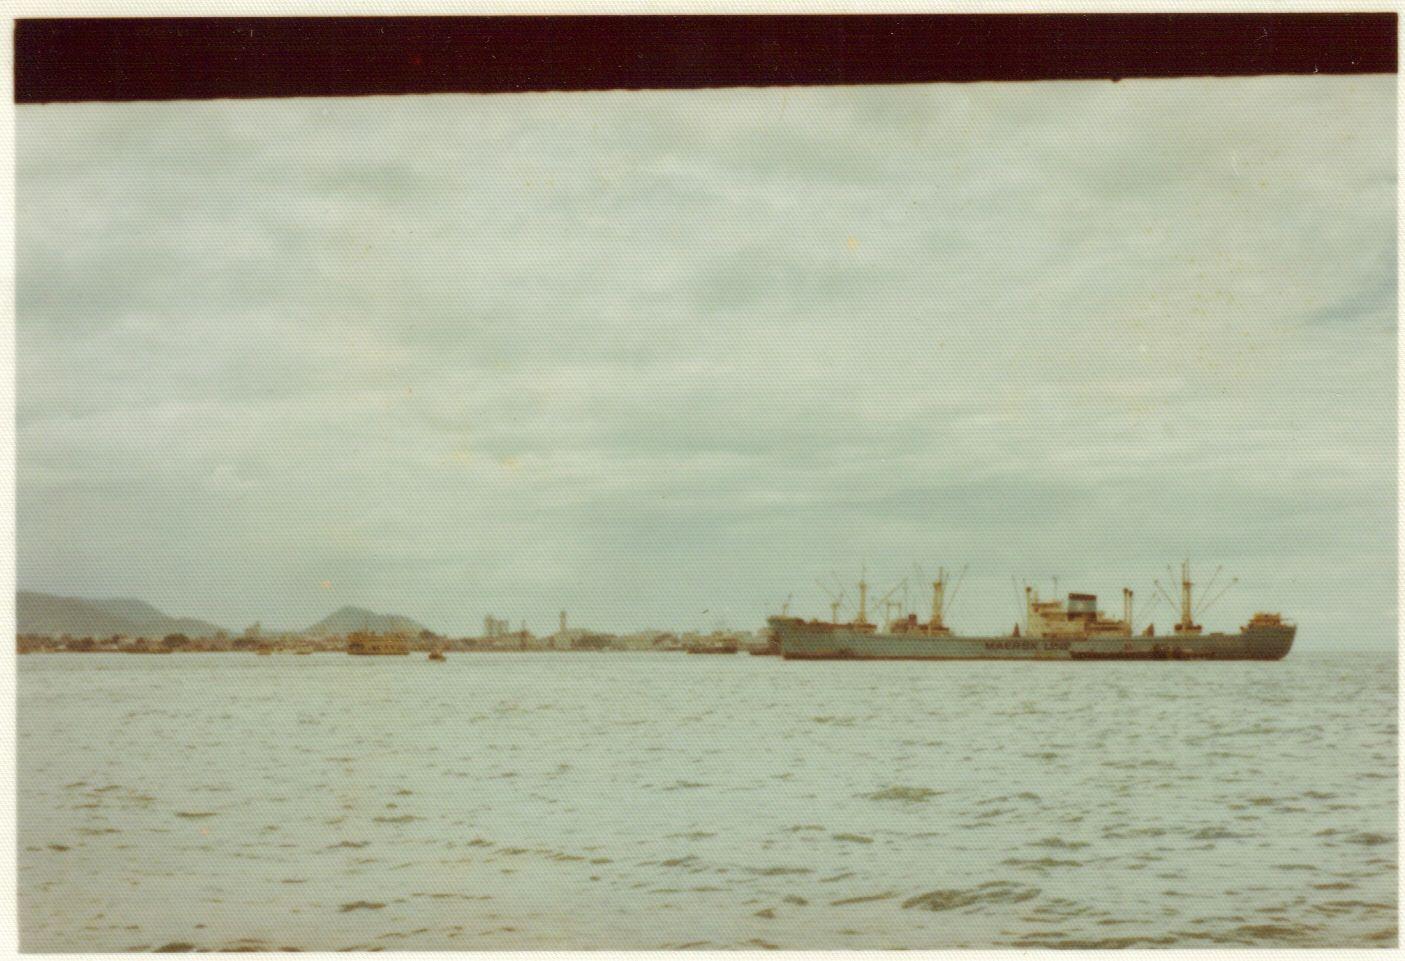 ship in Penang harbor, 1974.